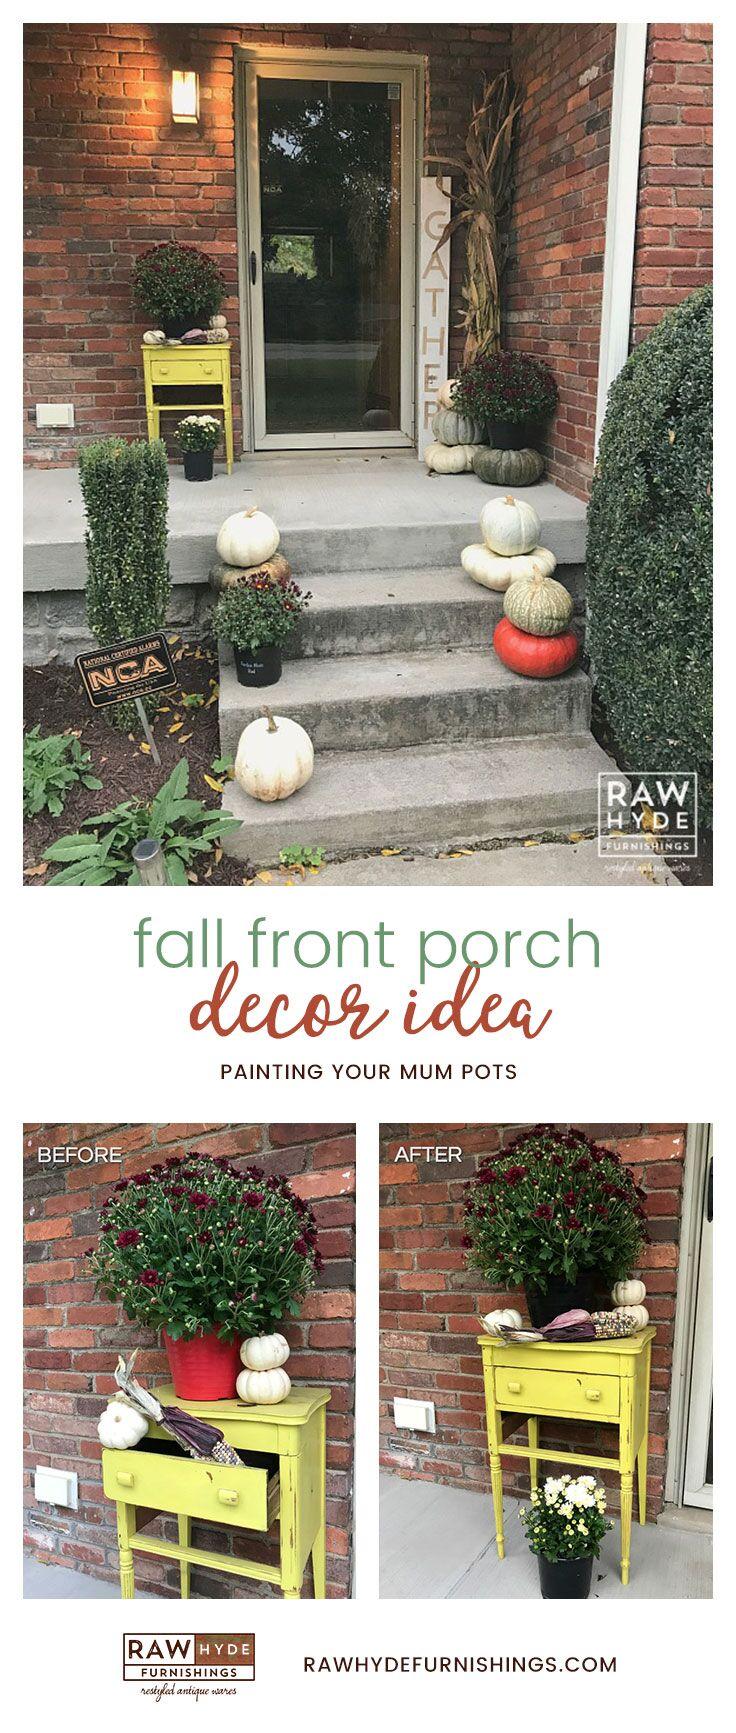 Fall Porch Decor Idea Pinterest Image